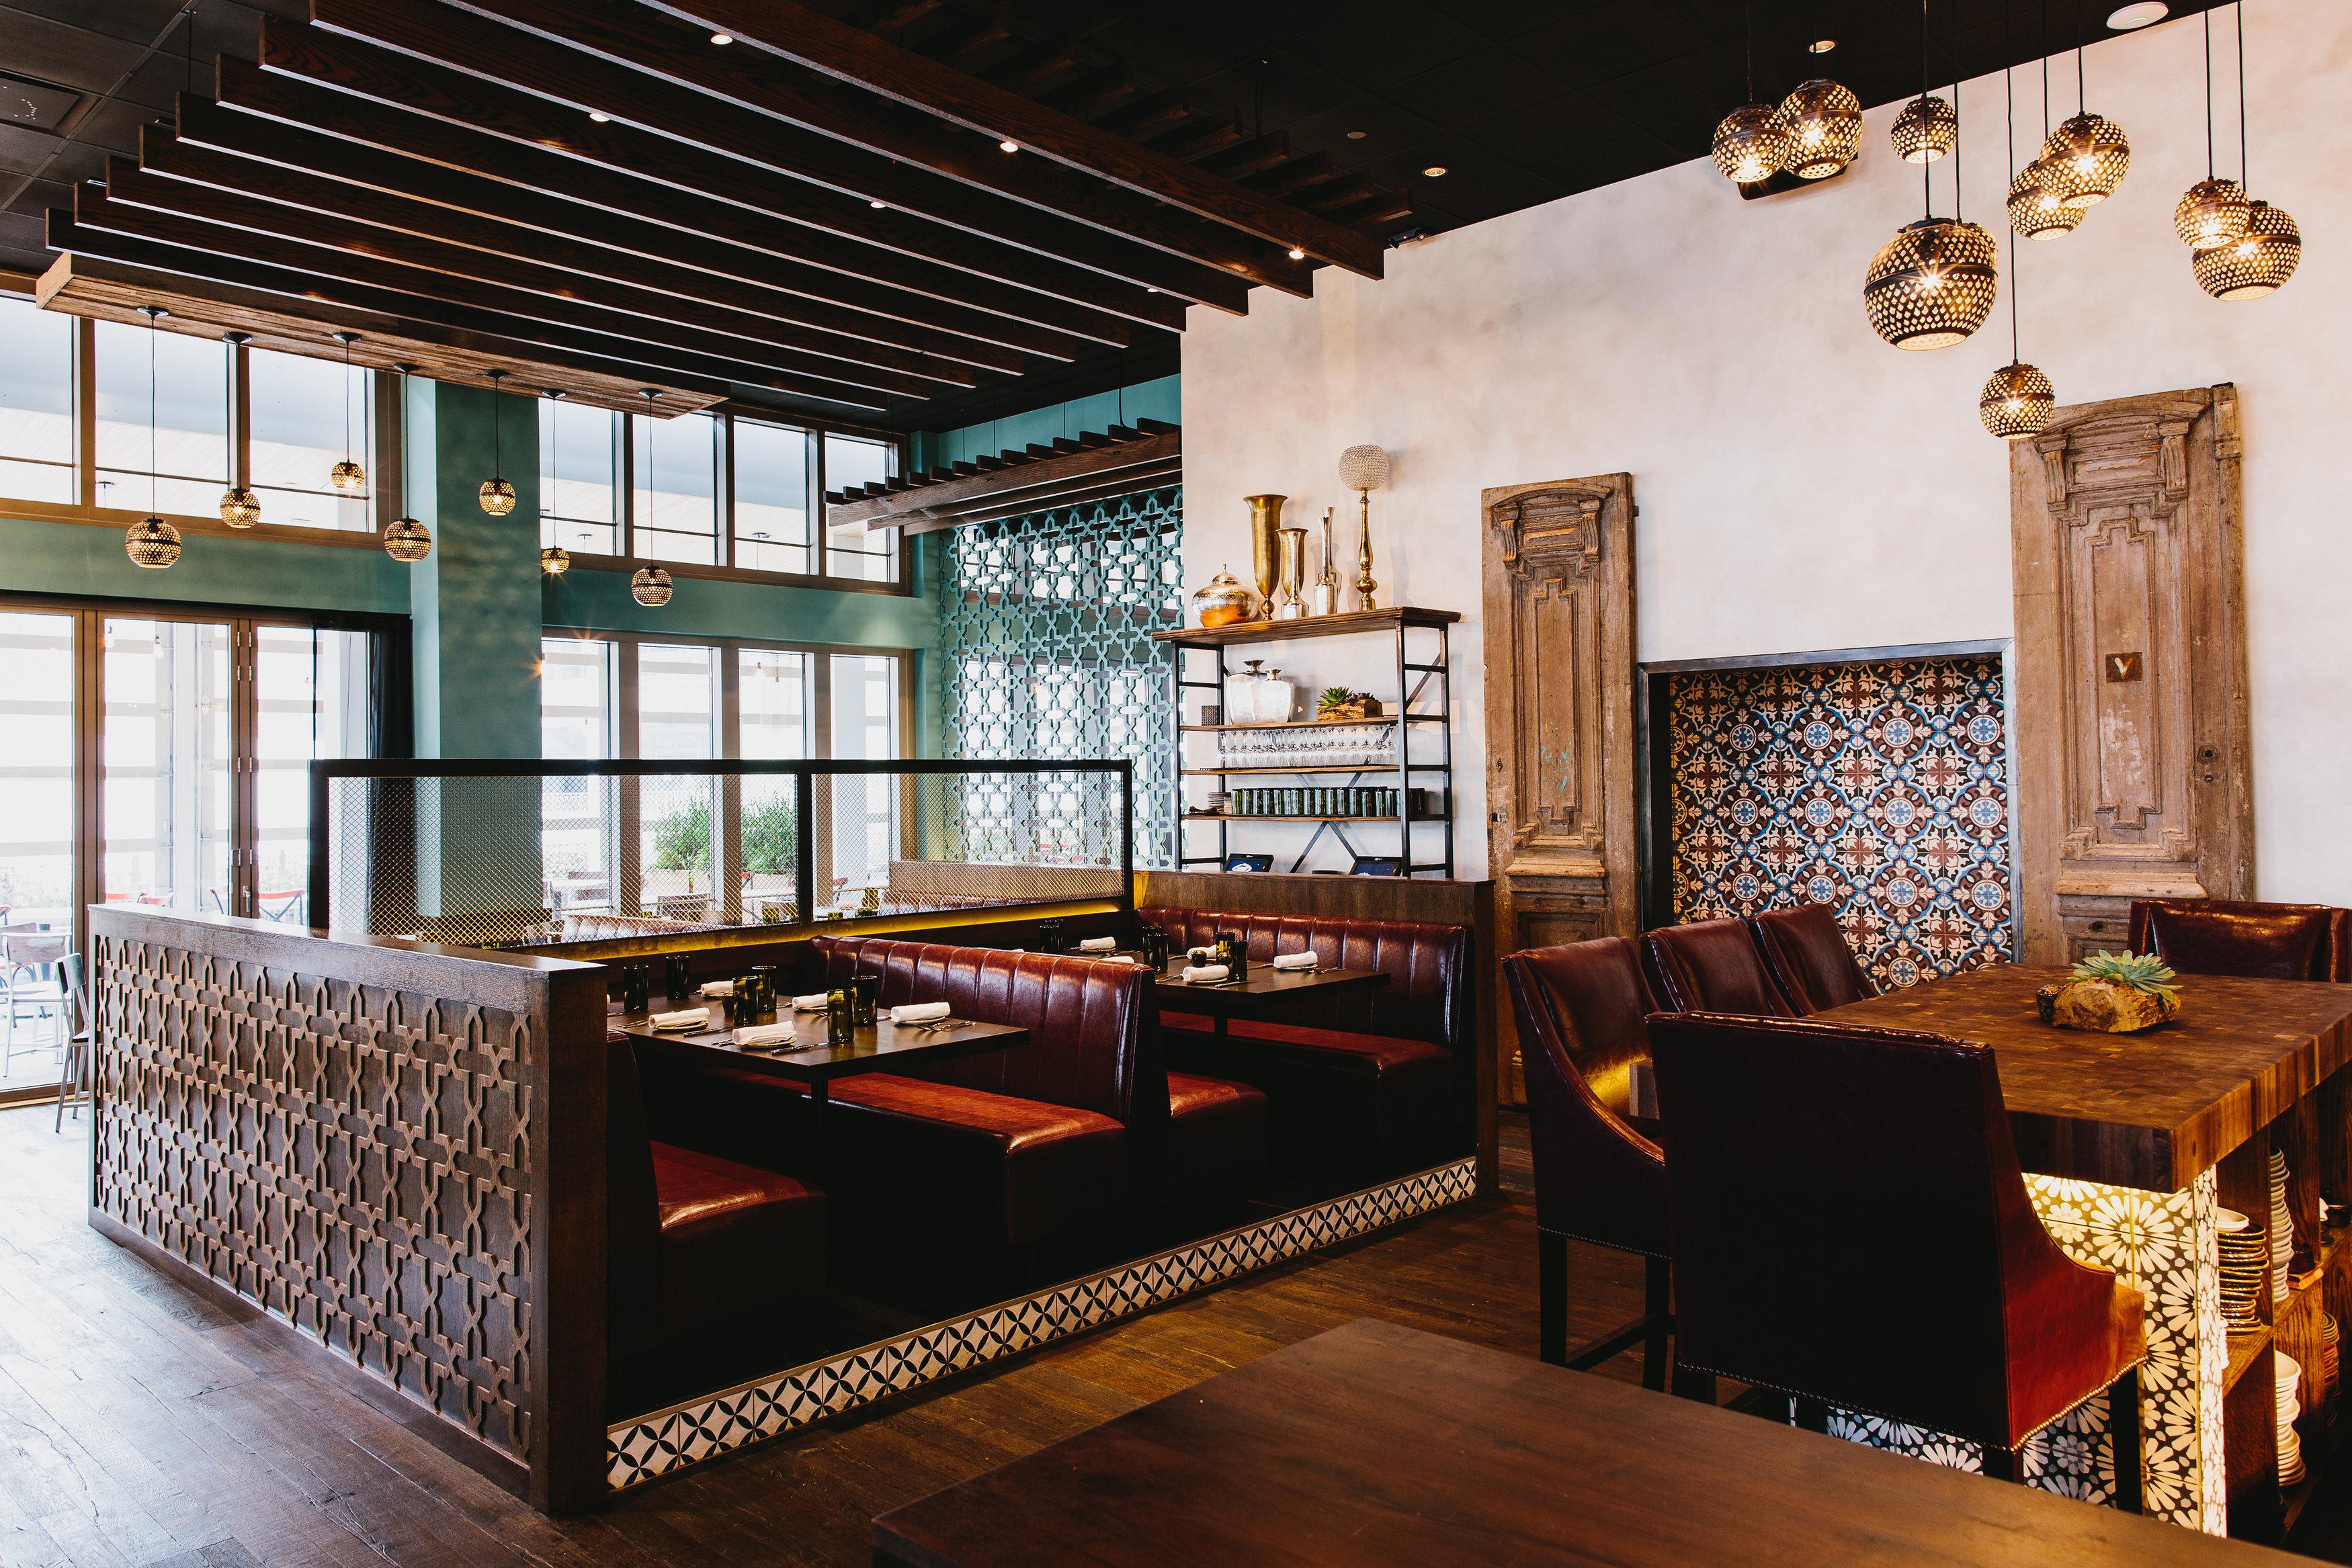 Gypsy Kitchen Heitler Houstoun Architects